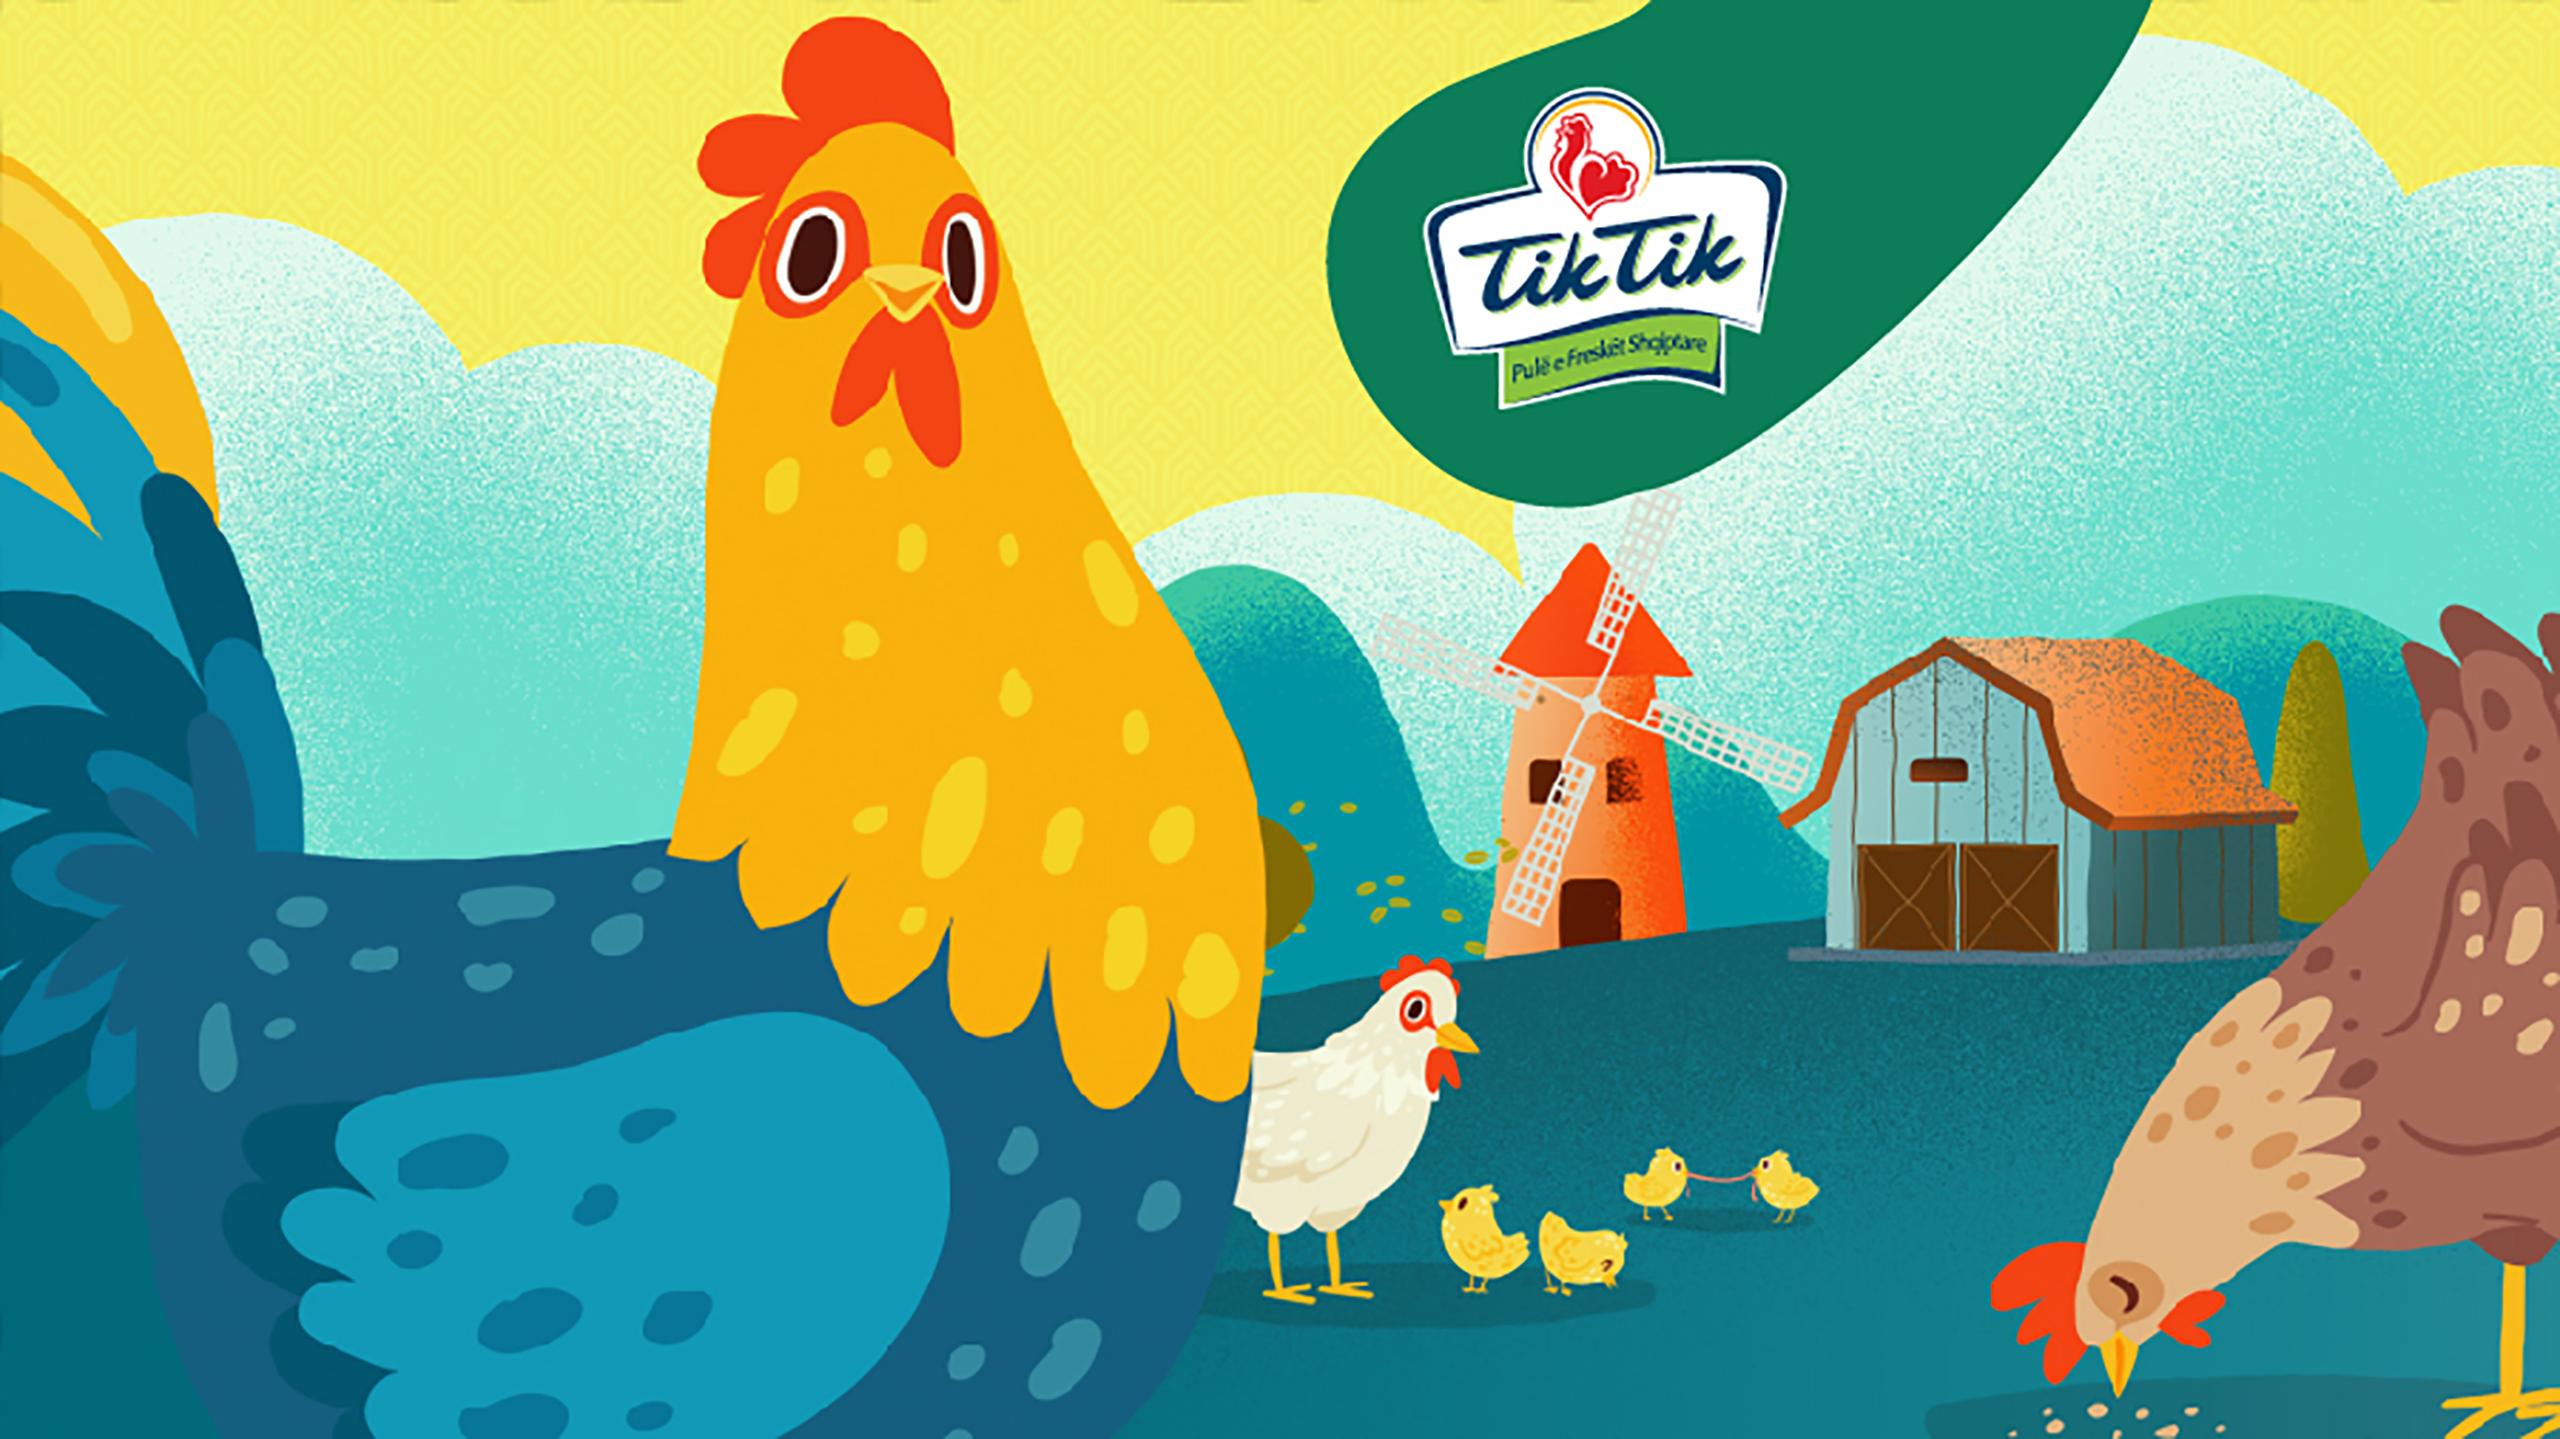 The biggest Albanian poultry producer, Tik Tik, chooses Vatra Agency as its social media agency.